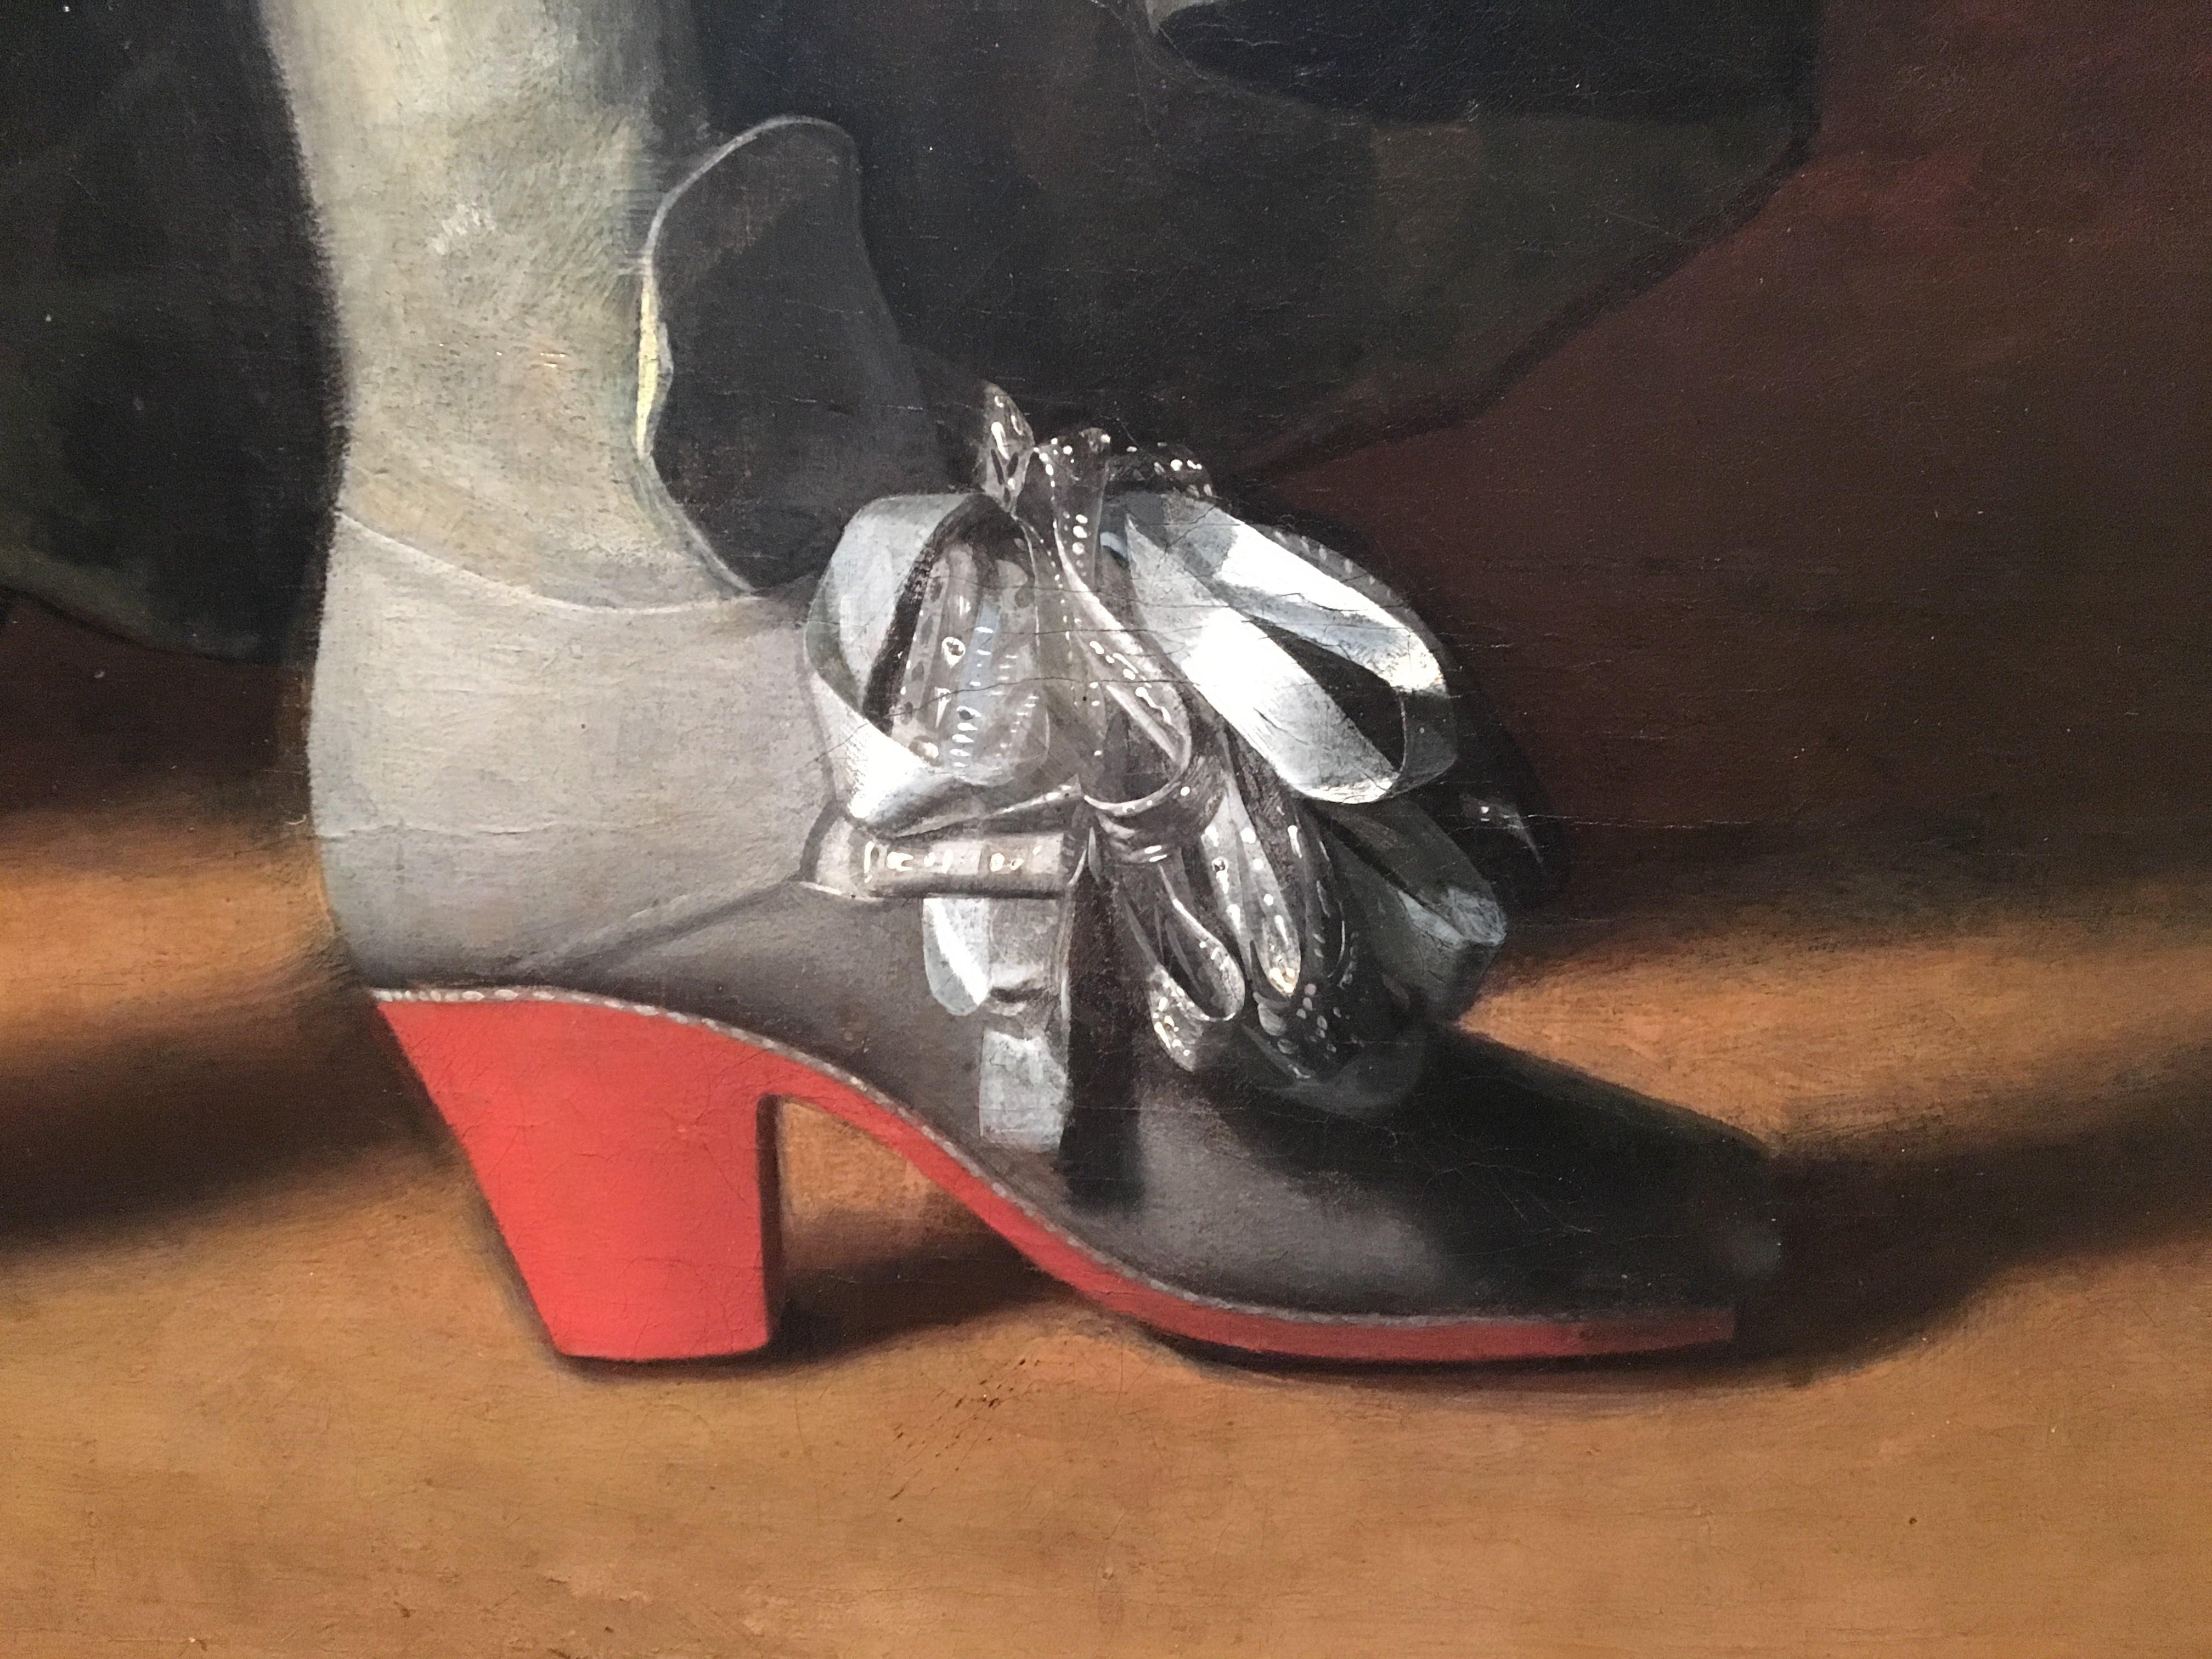 Charles IIs shoe